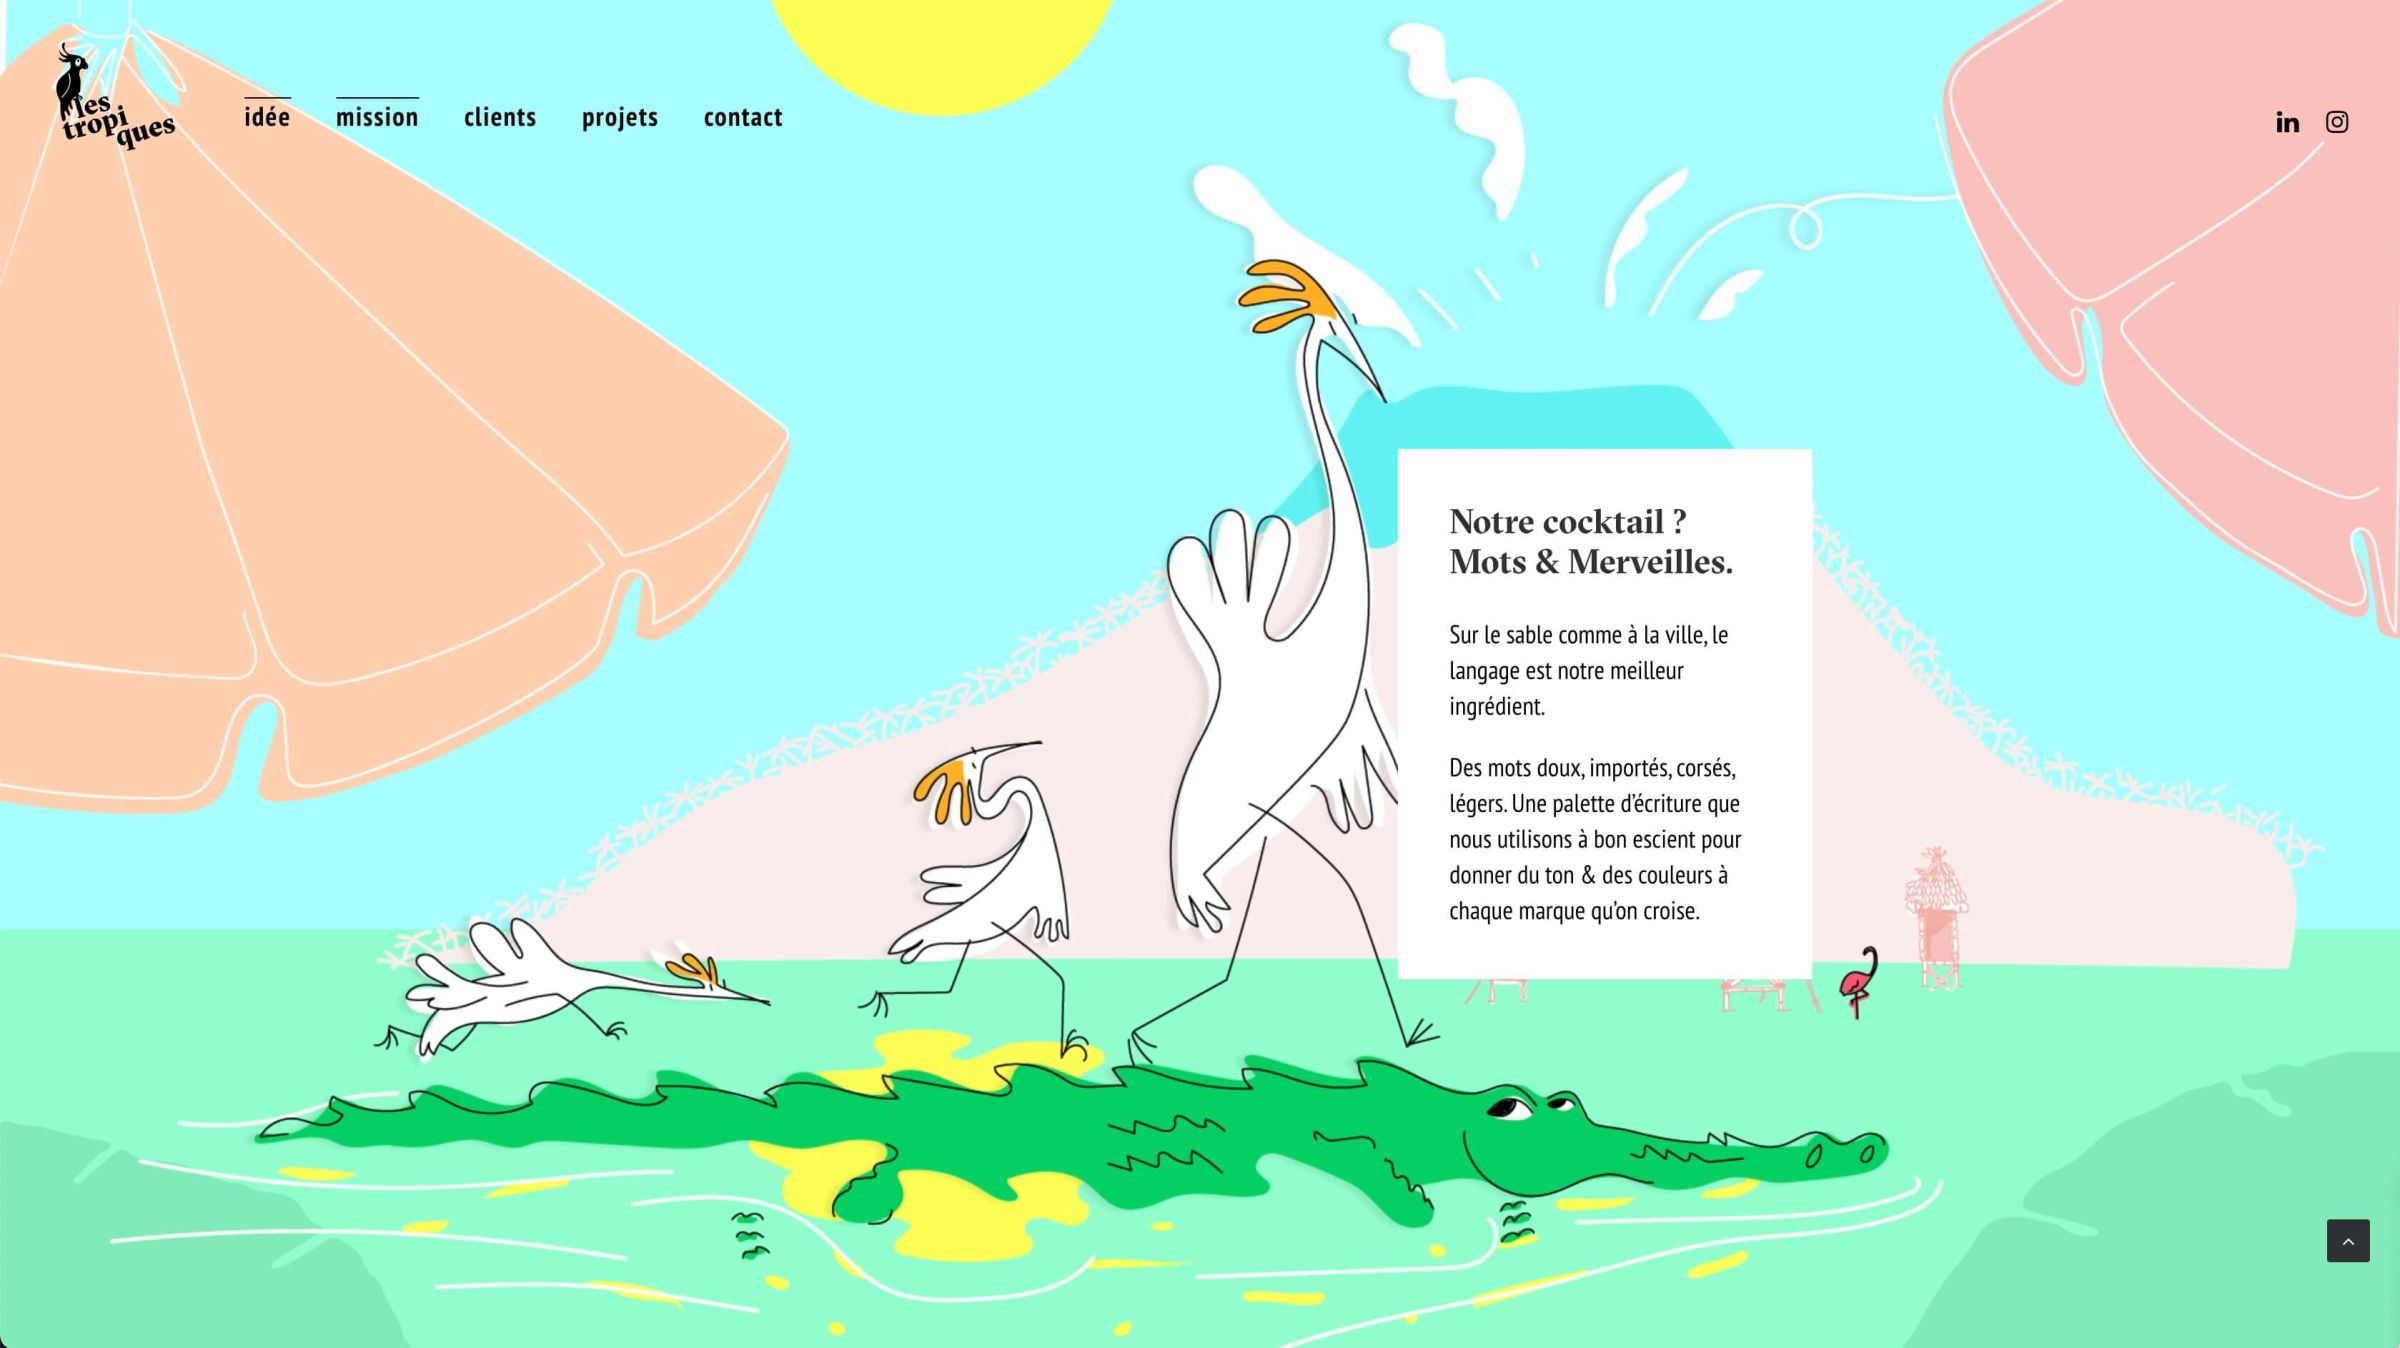 lestropiquesstudio-website-screenshot